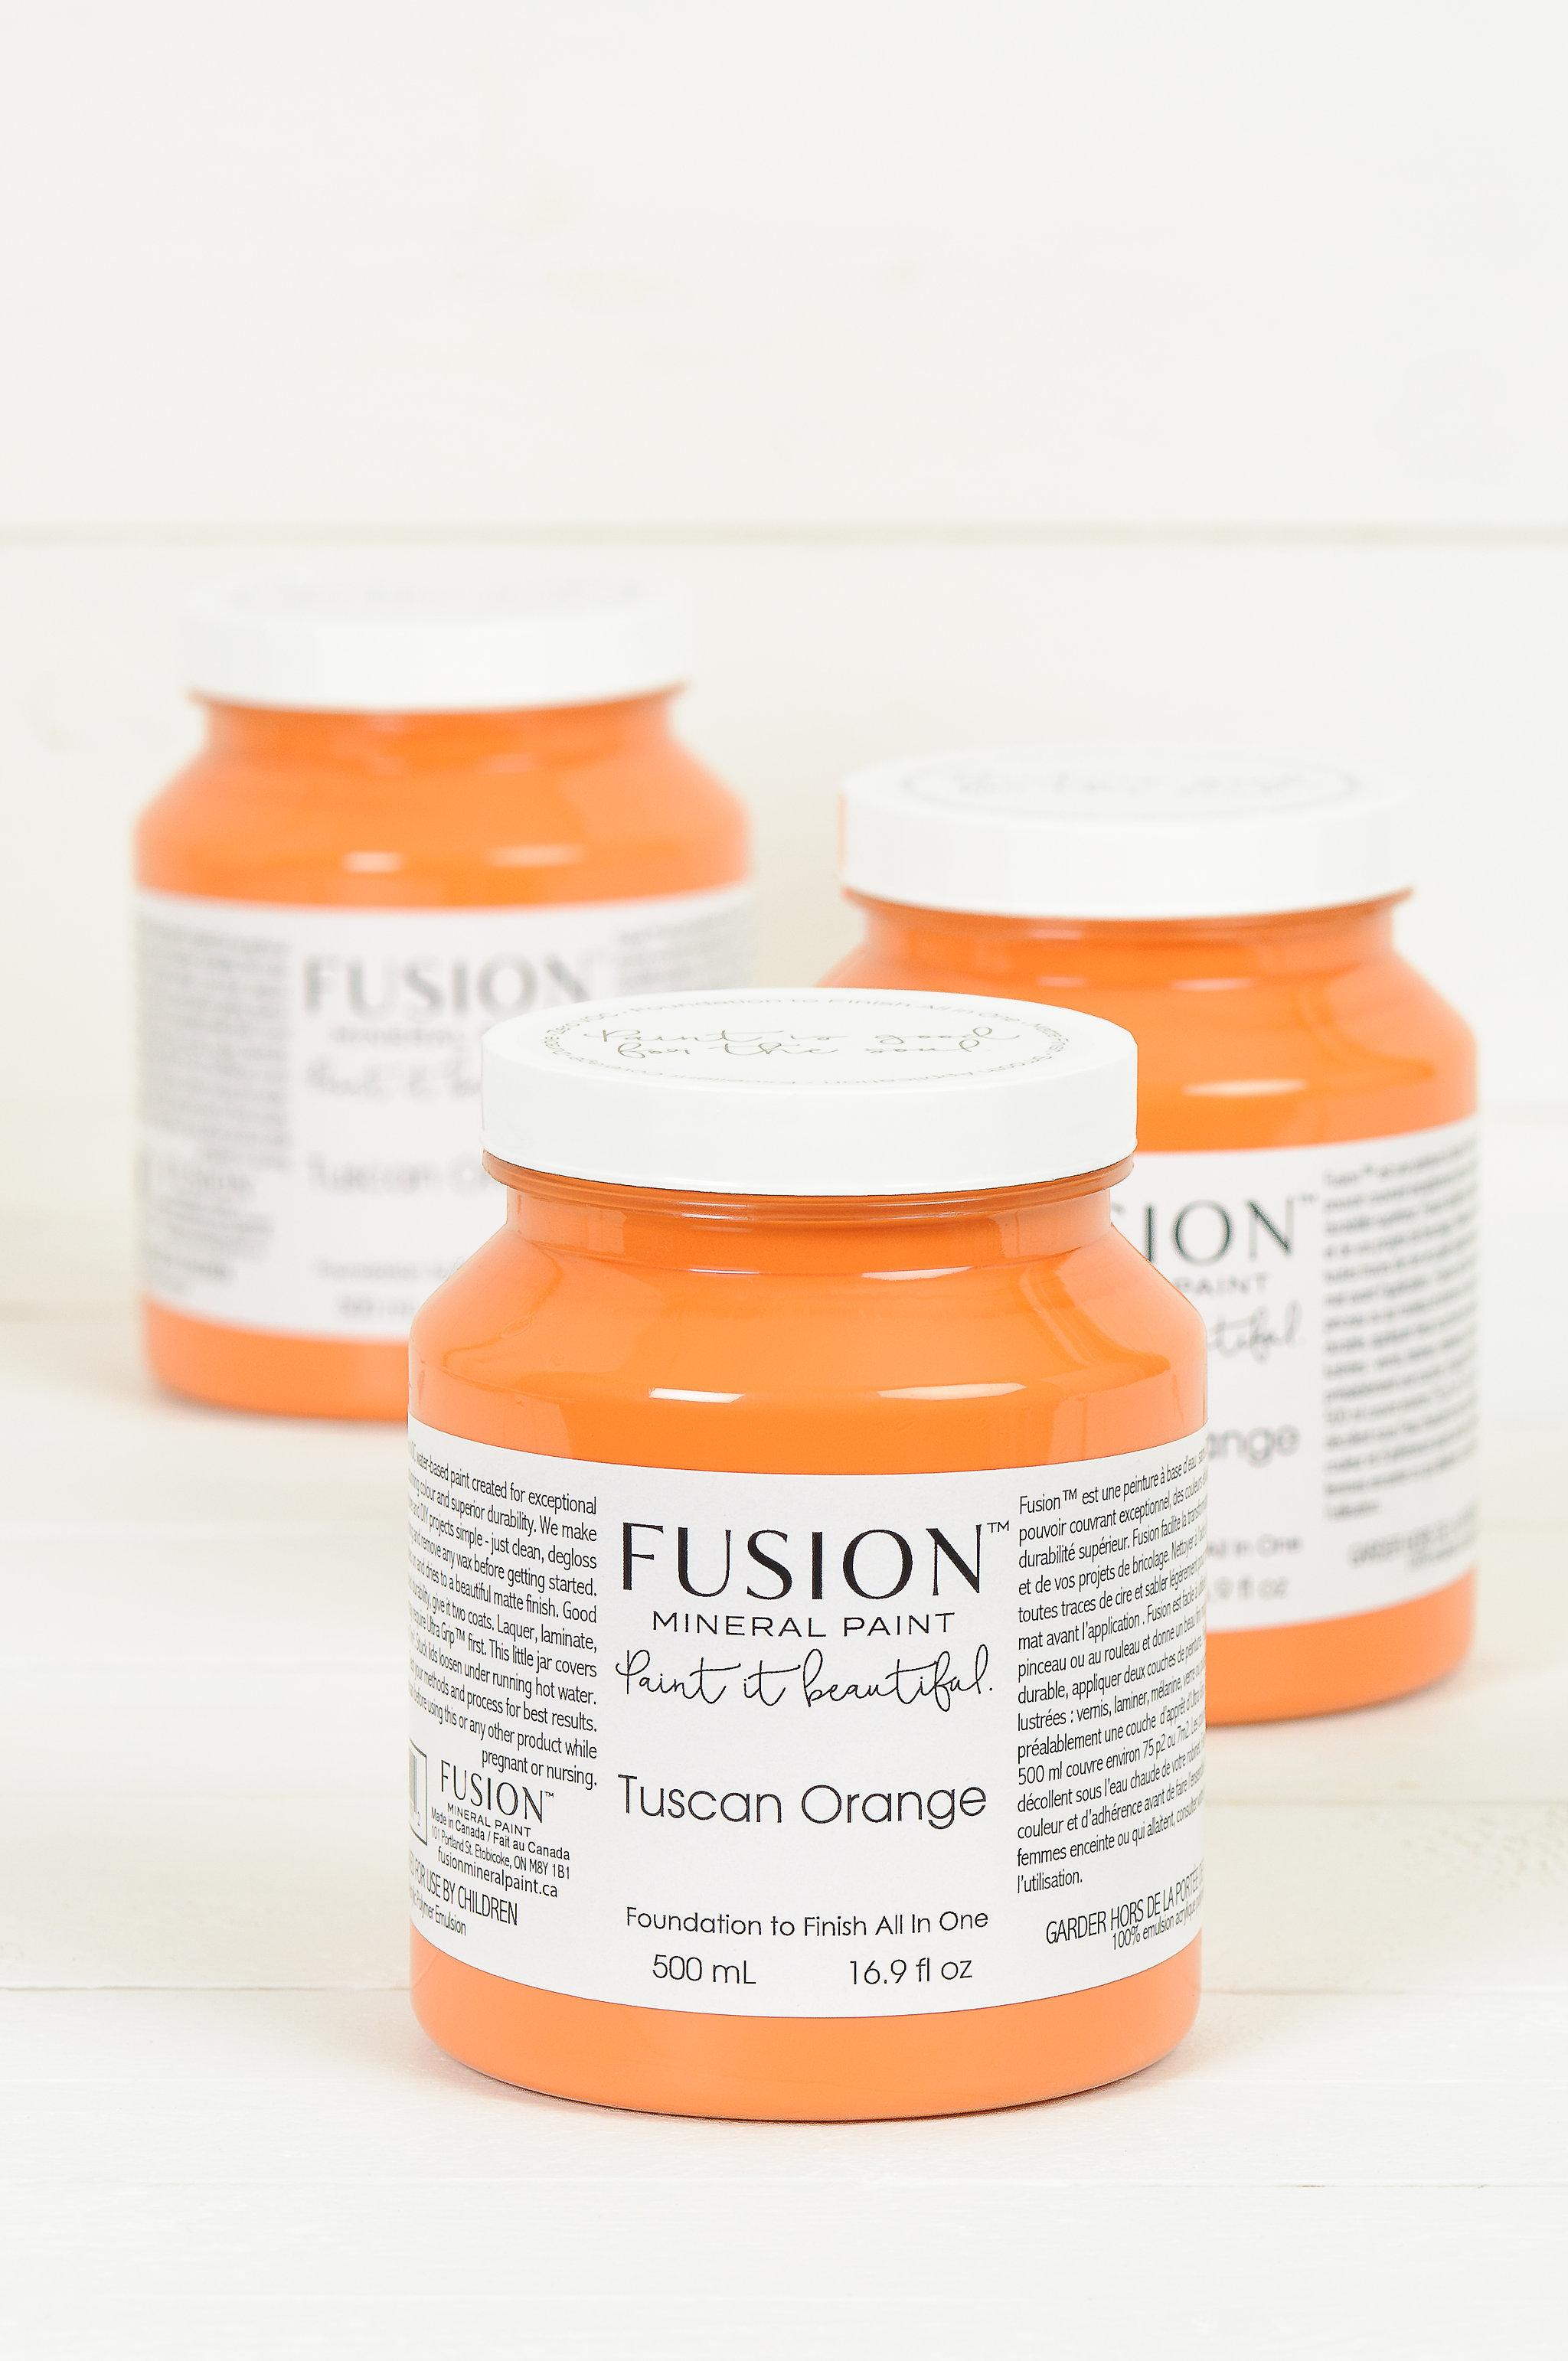 Fusion Mineral Paint Tuscan Orange